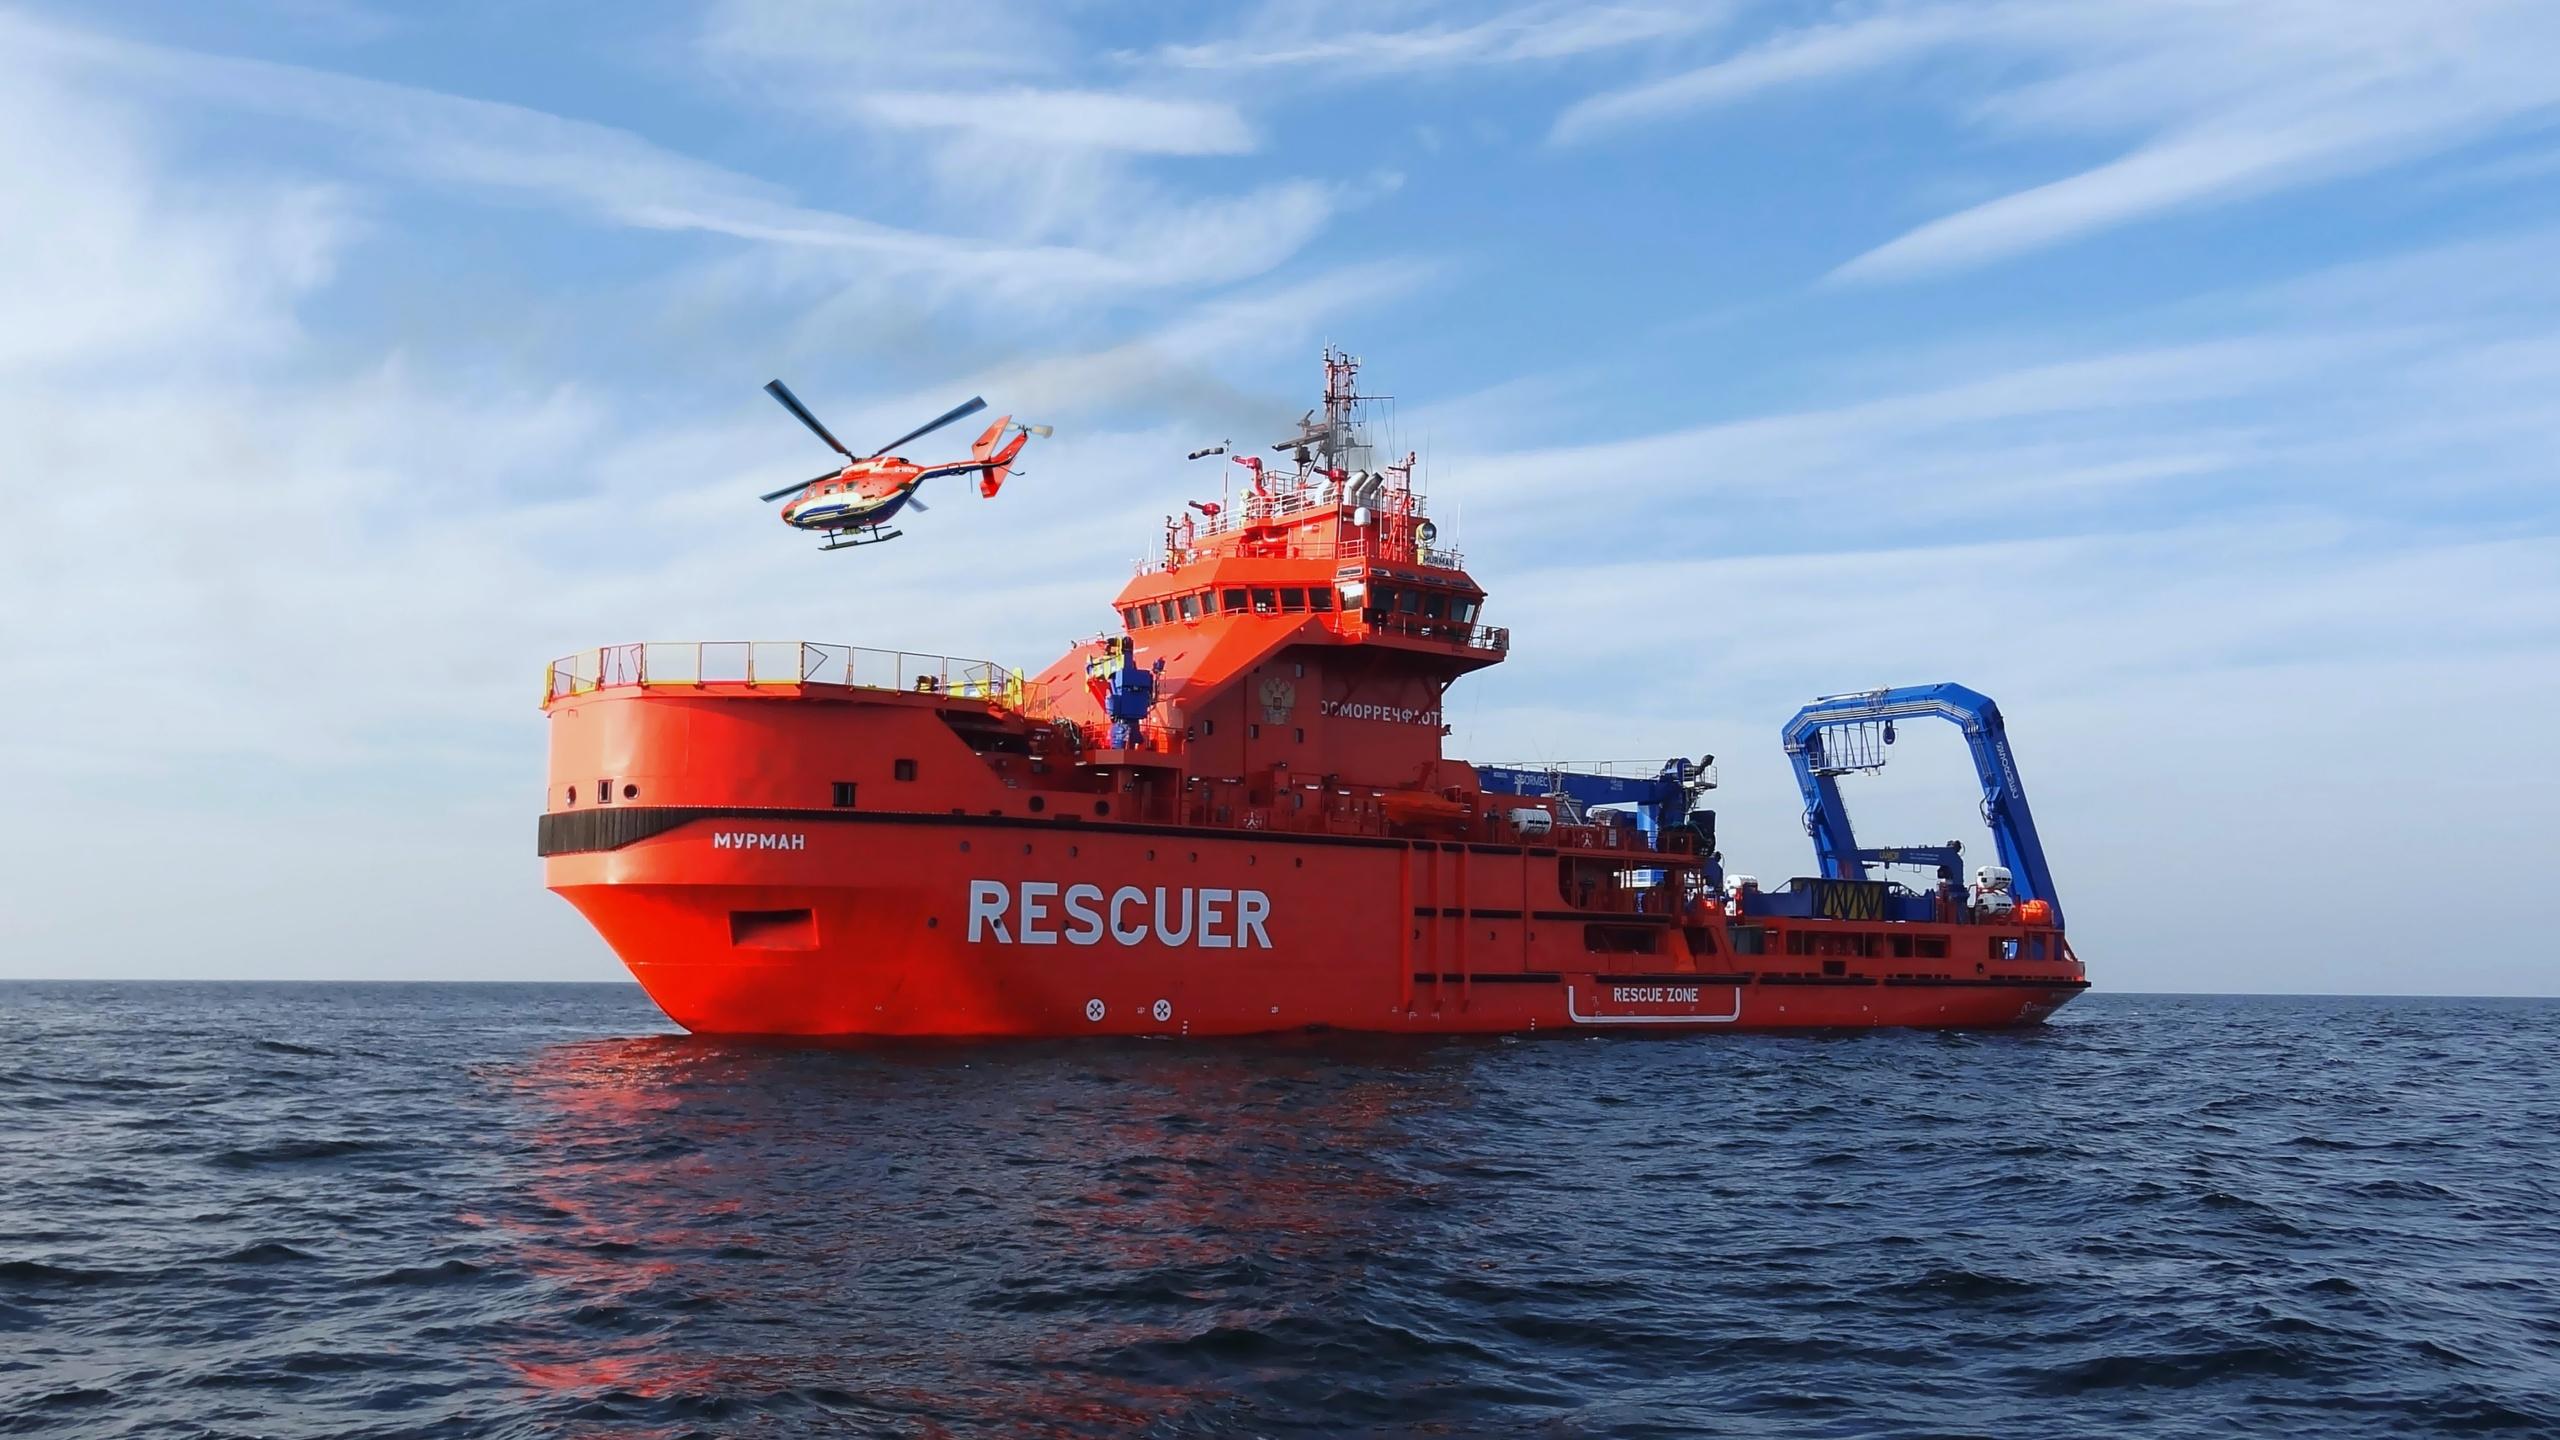 море, спасатель, корабль